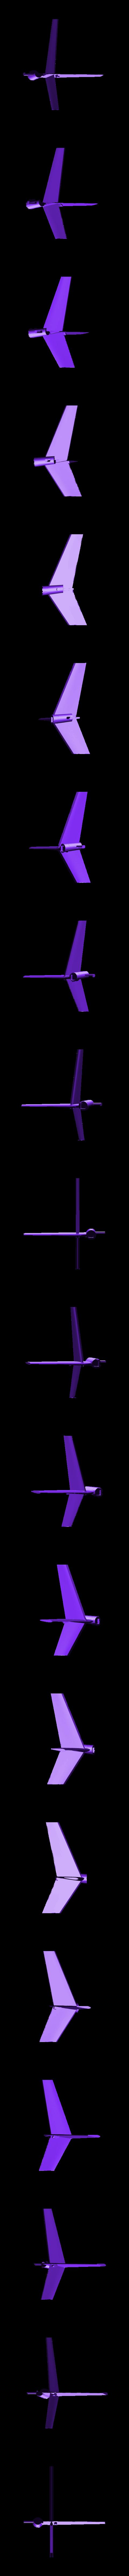 Tail.stl Download STL file Robinson Raven R44 3D print model • 3D printer model, Eduardohbm